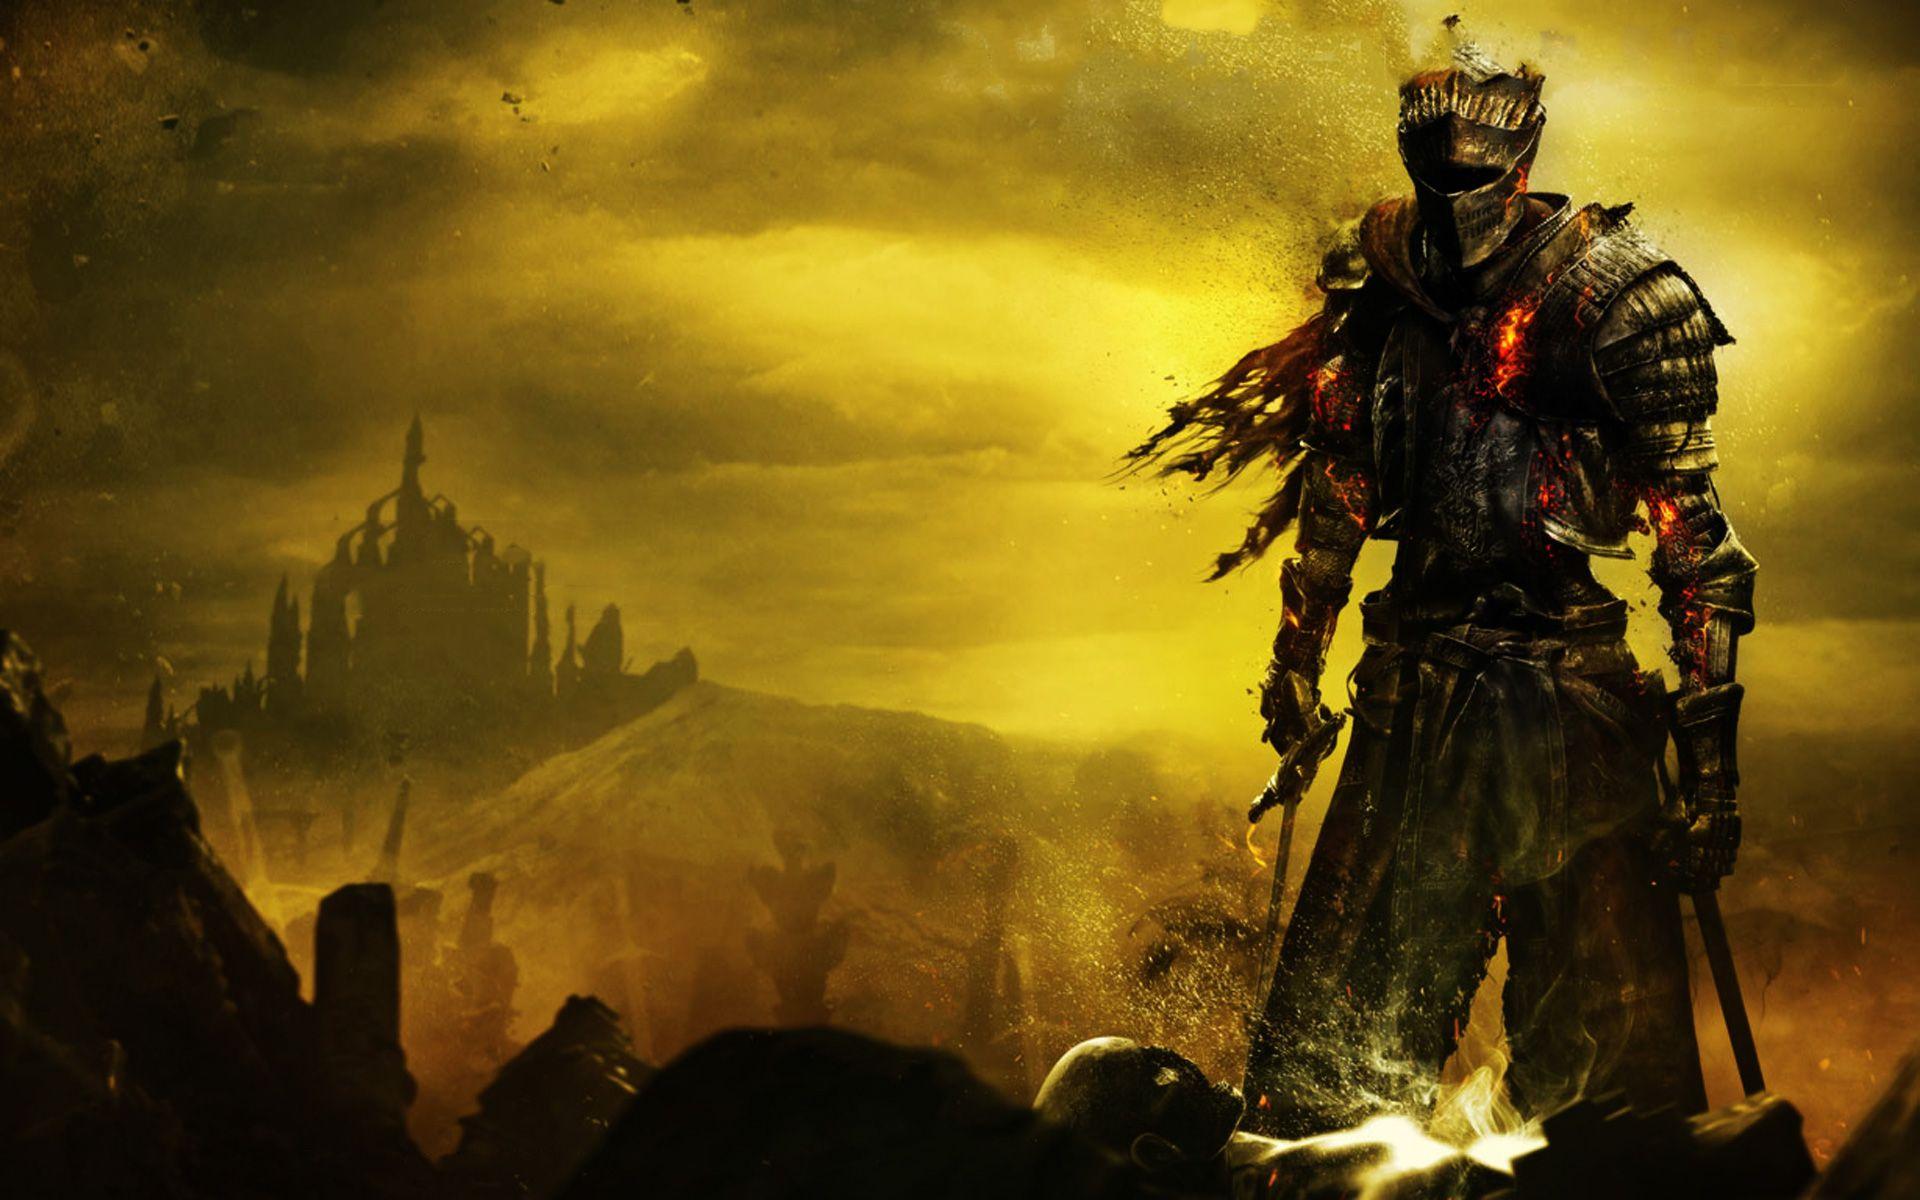 Dark Souls 3 Wallpaper Hd Best Wallpaper Hd Dark Souls Dark Souls 3 Dark Souls Wallpaper